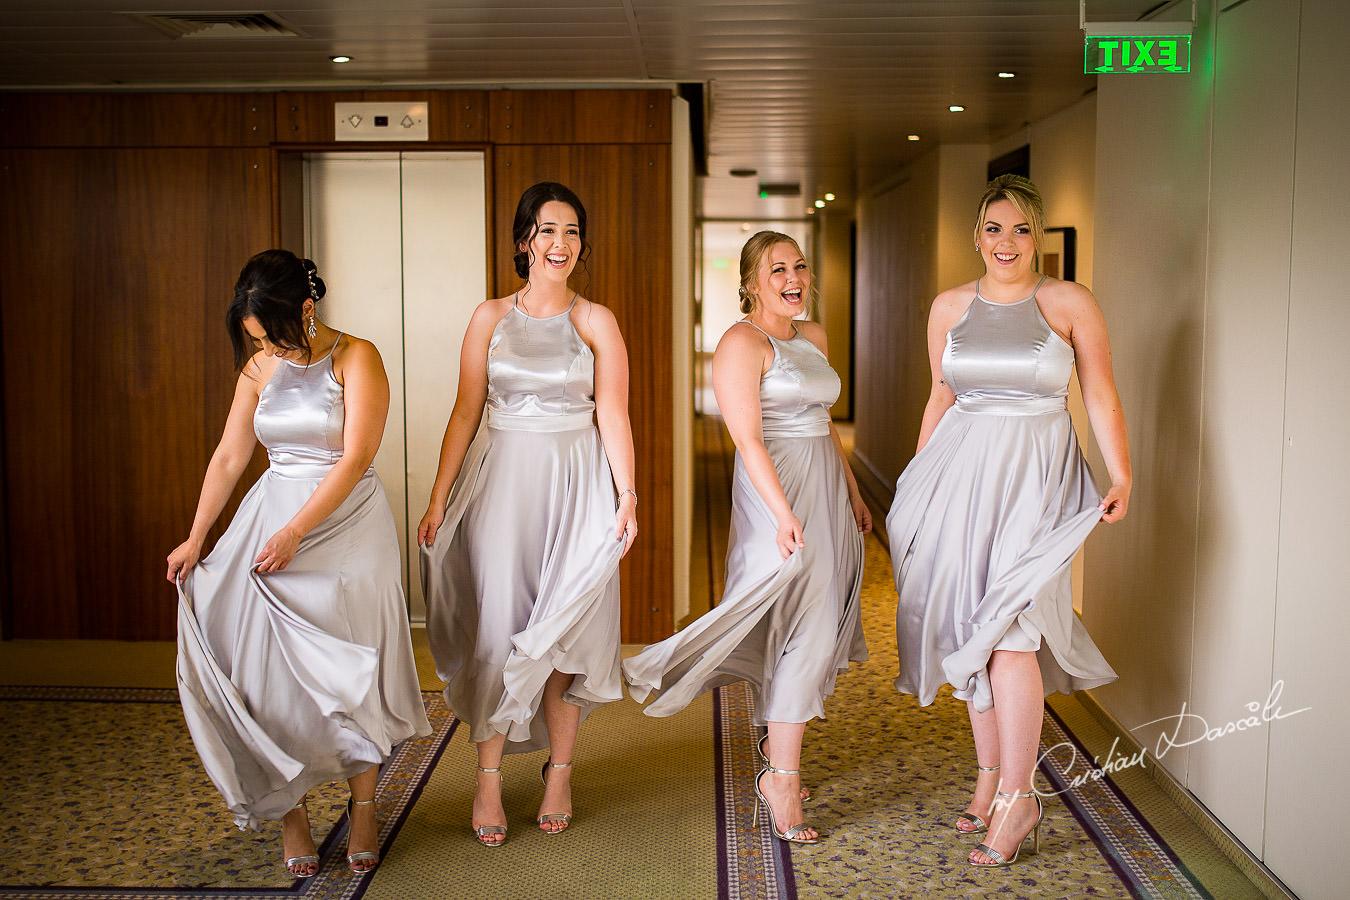 The Bridesmaids having fun during a Beautiful Wedding at Elias Beach Hotel captured by Cyprus Photographer Cristian Dascalu.